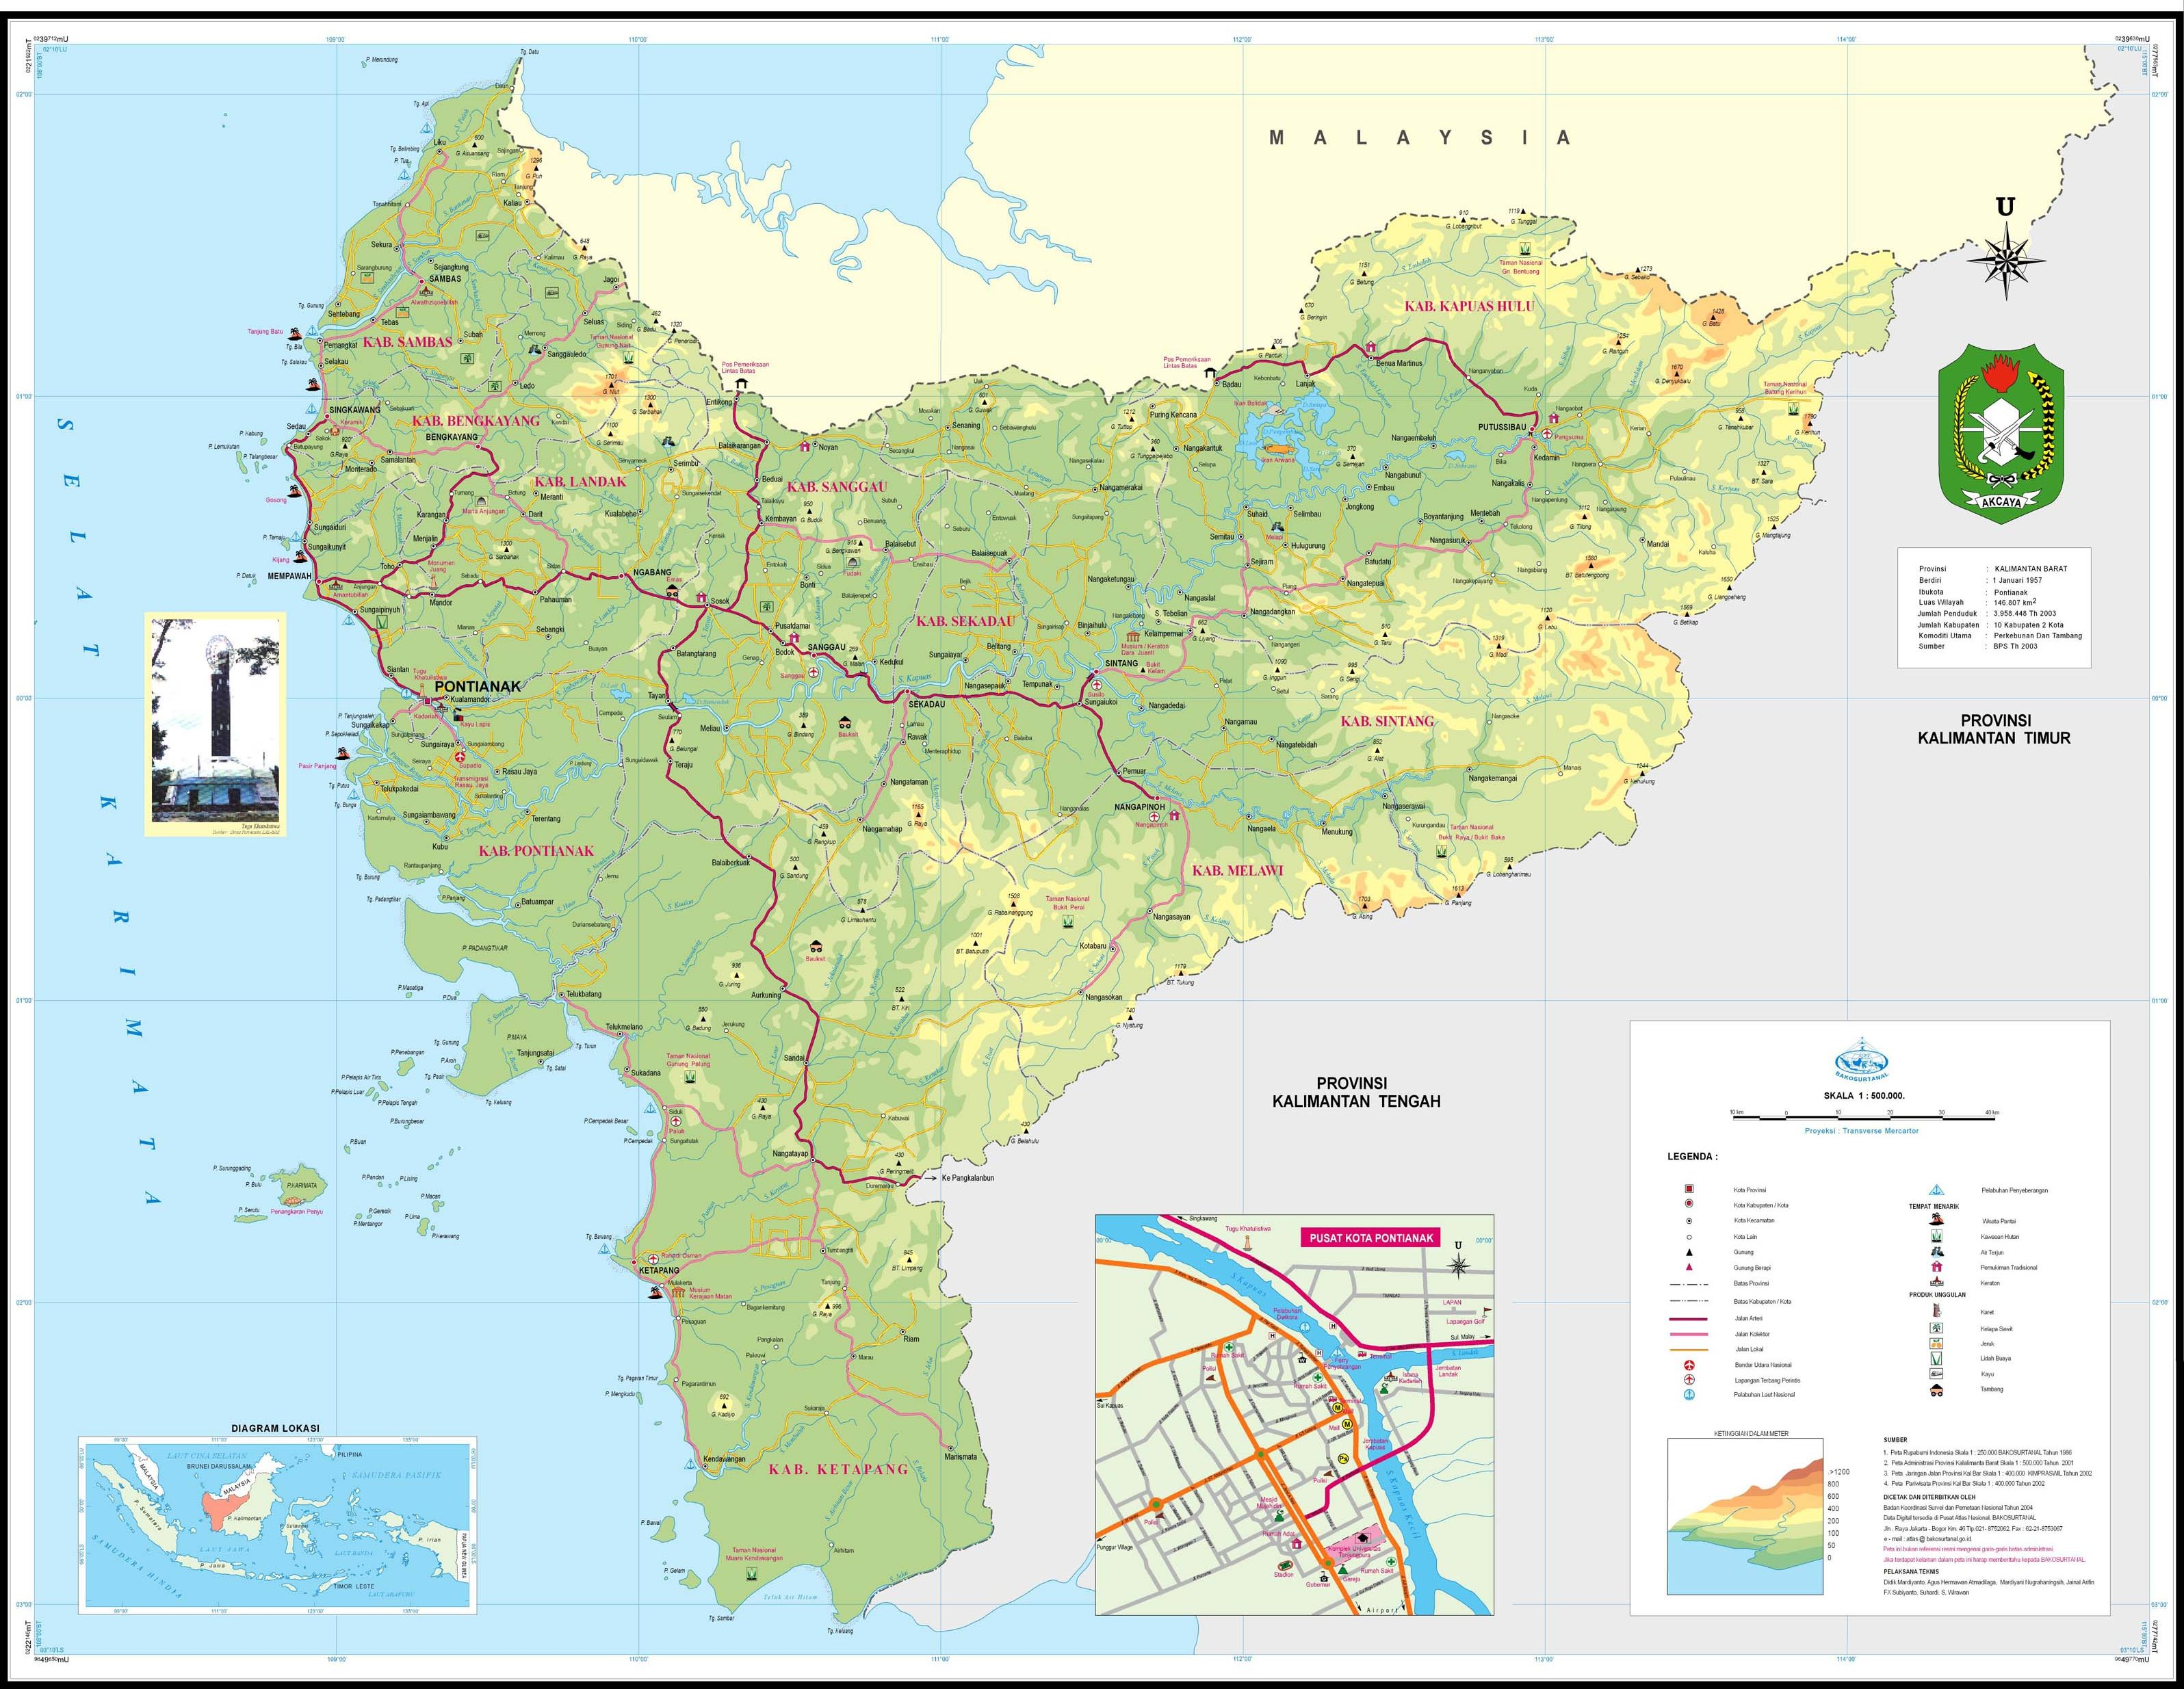 peta kalimantan hd barat timur utara selatan tengah lengkap the book peta kalimantan hd barat timur